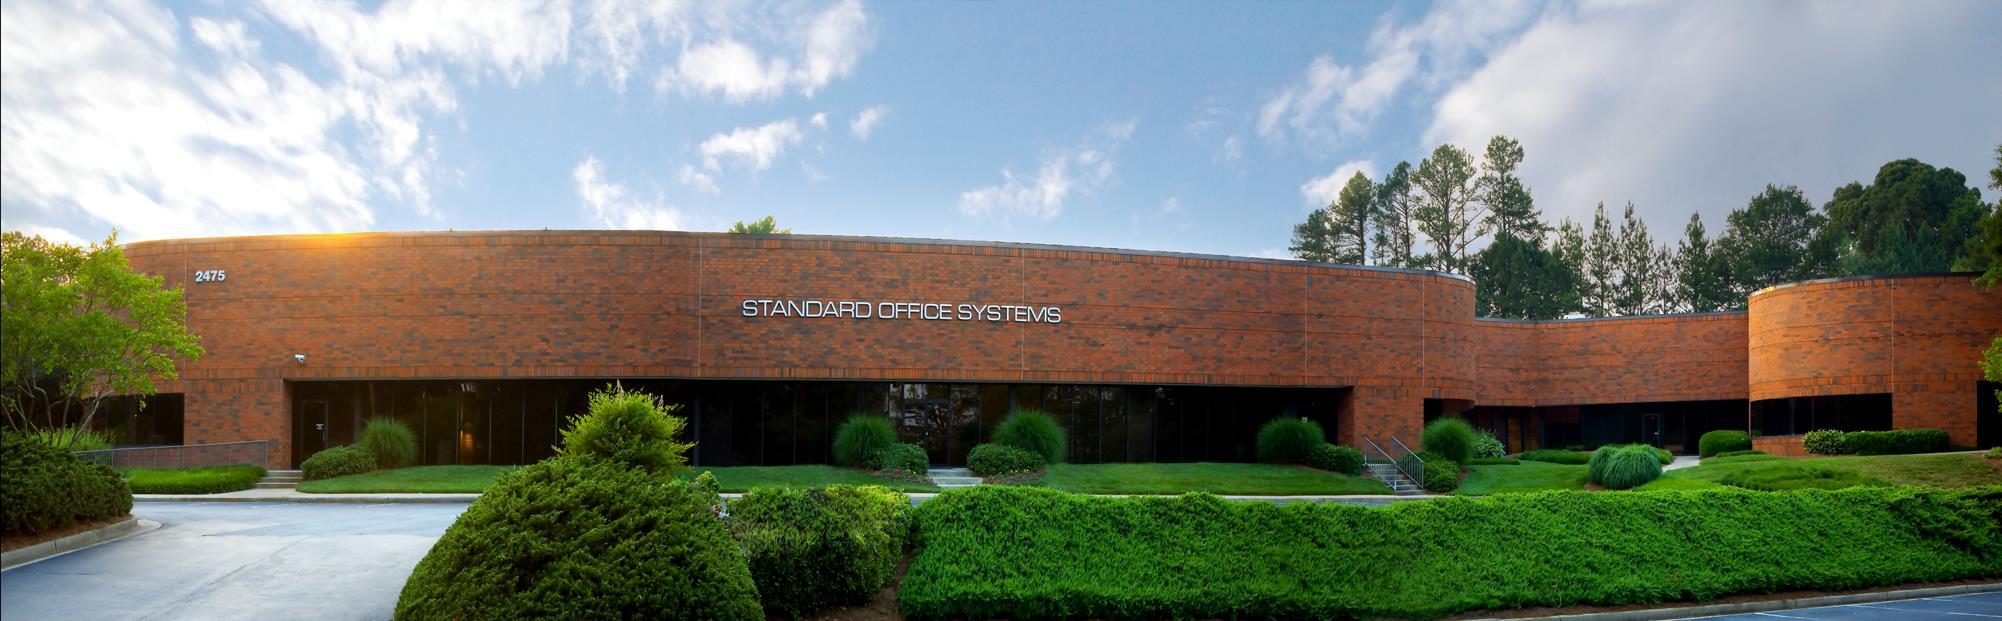 Standard Office Systems of Atlanta